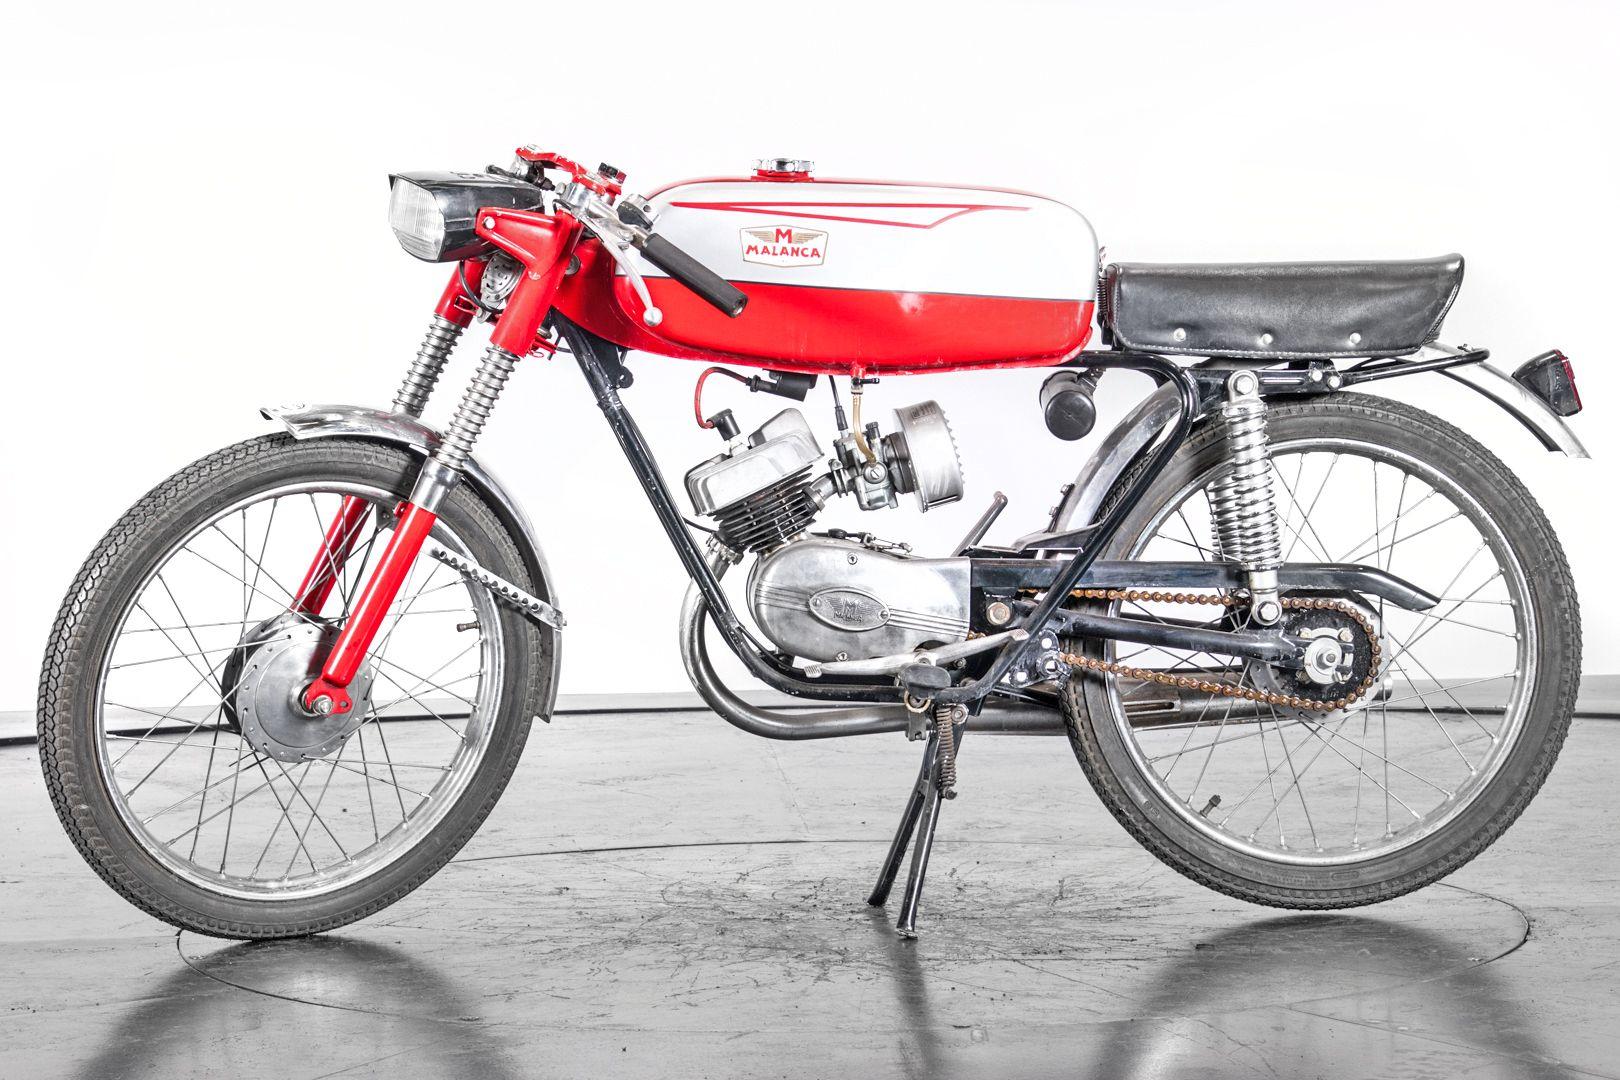 1963 Malanca Sport 41177